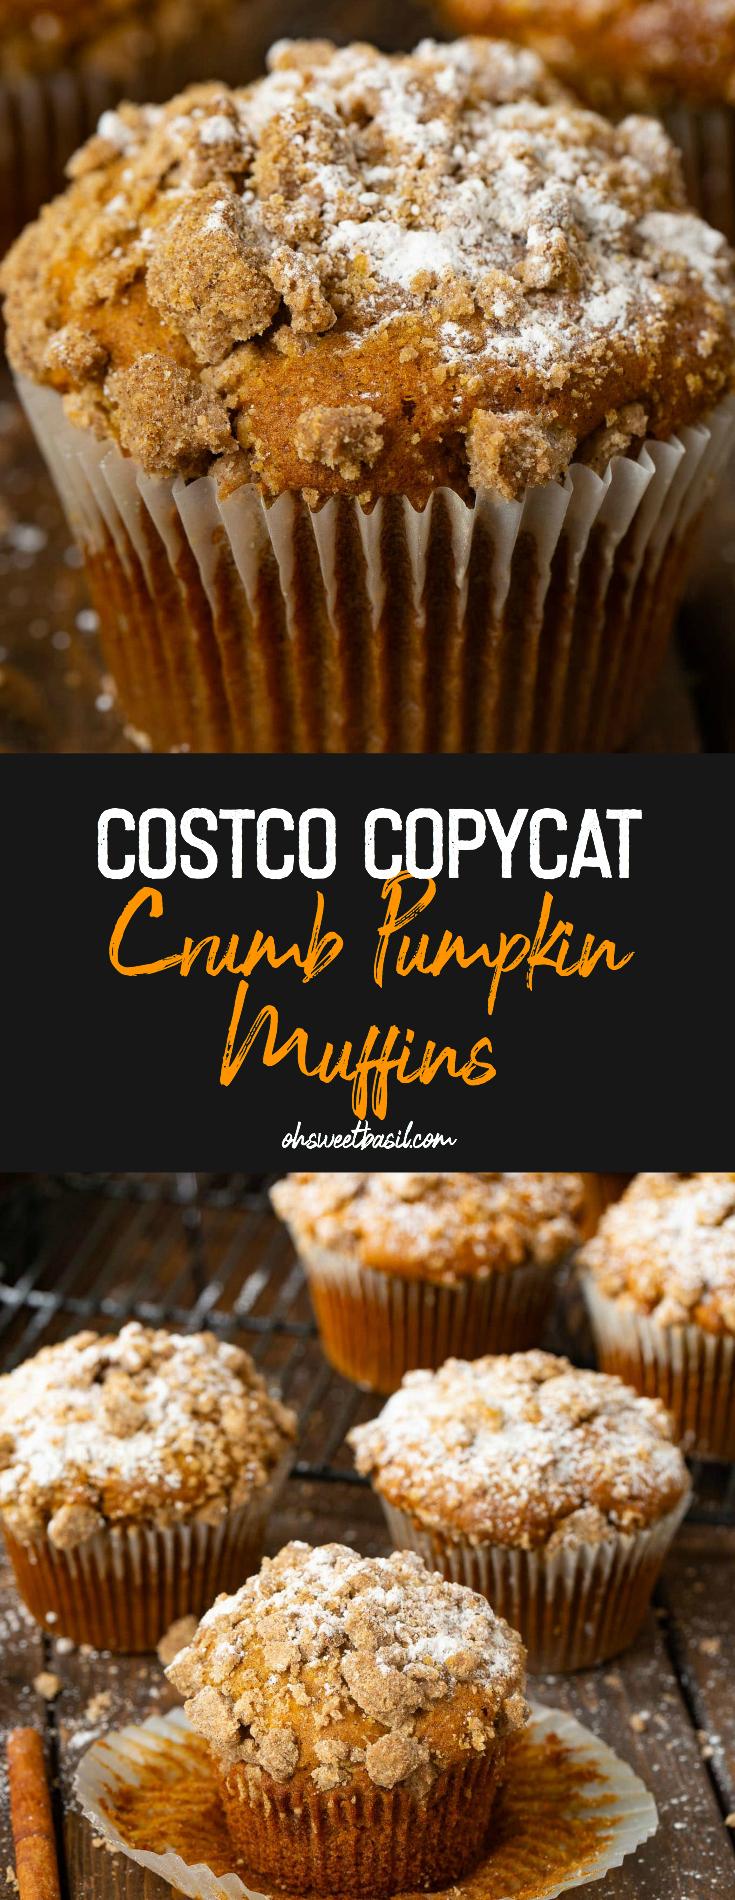 Costco Copycat Crumb Pumpkin Muffins - Oh Sweet Basil